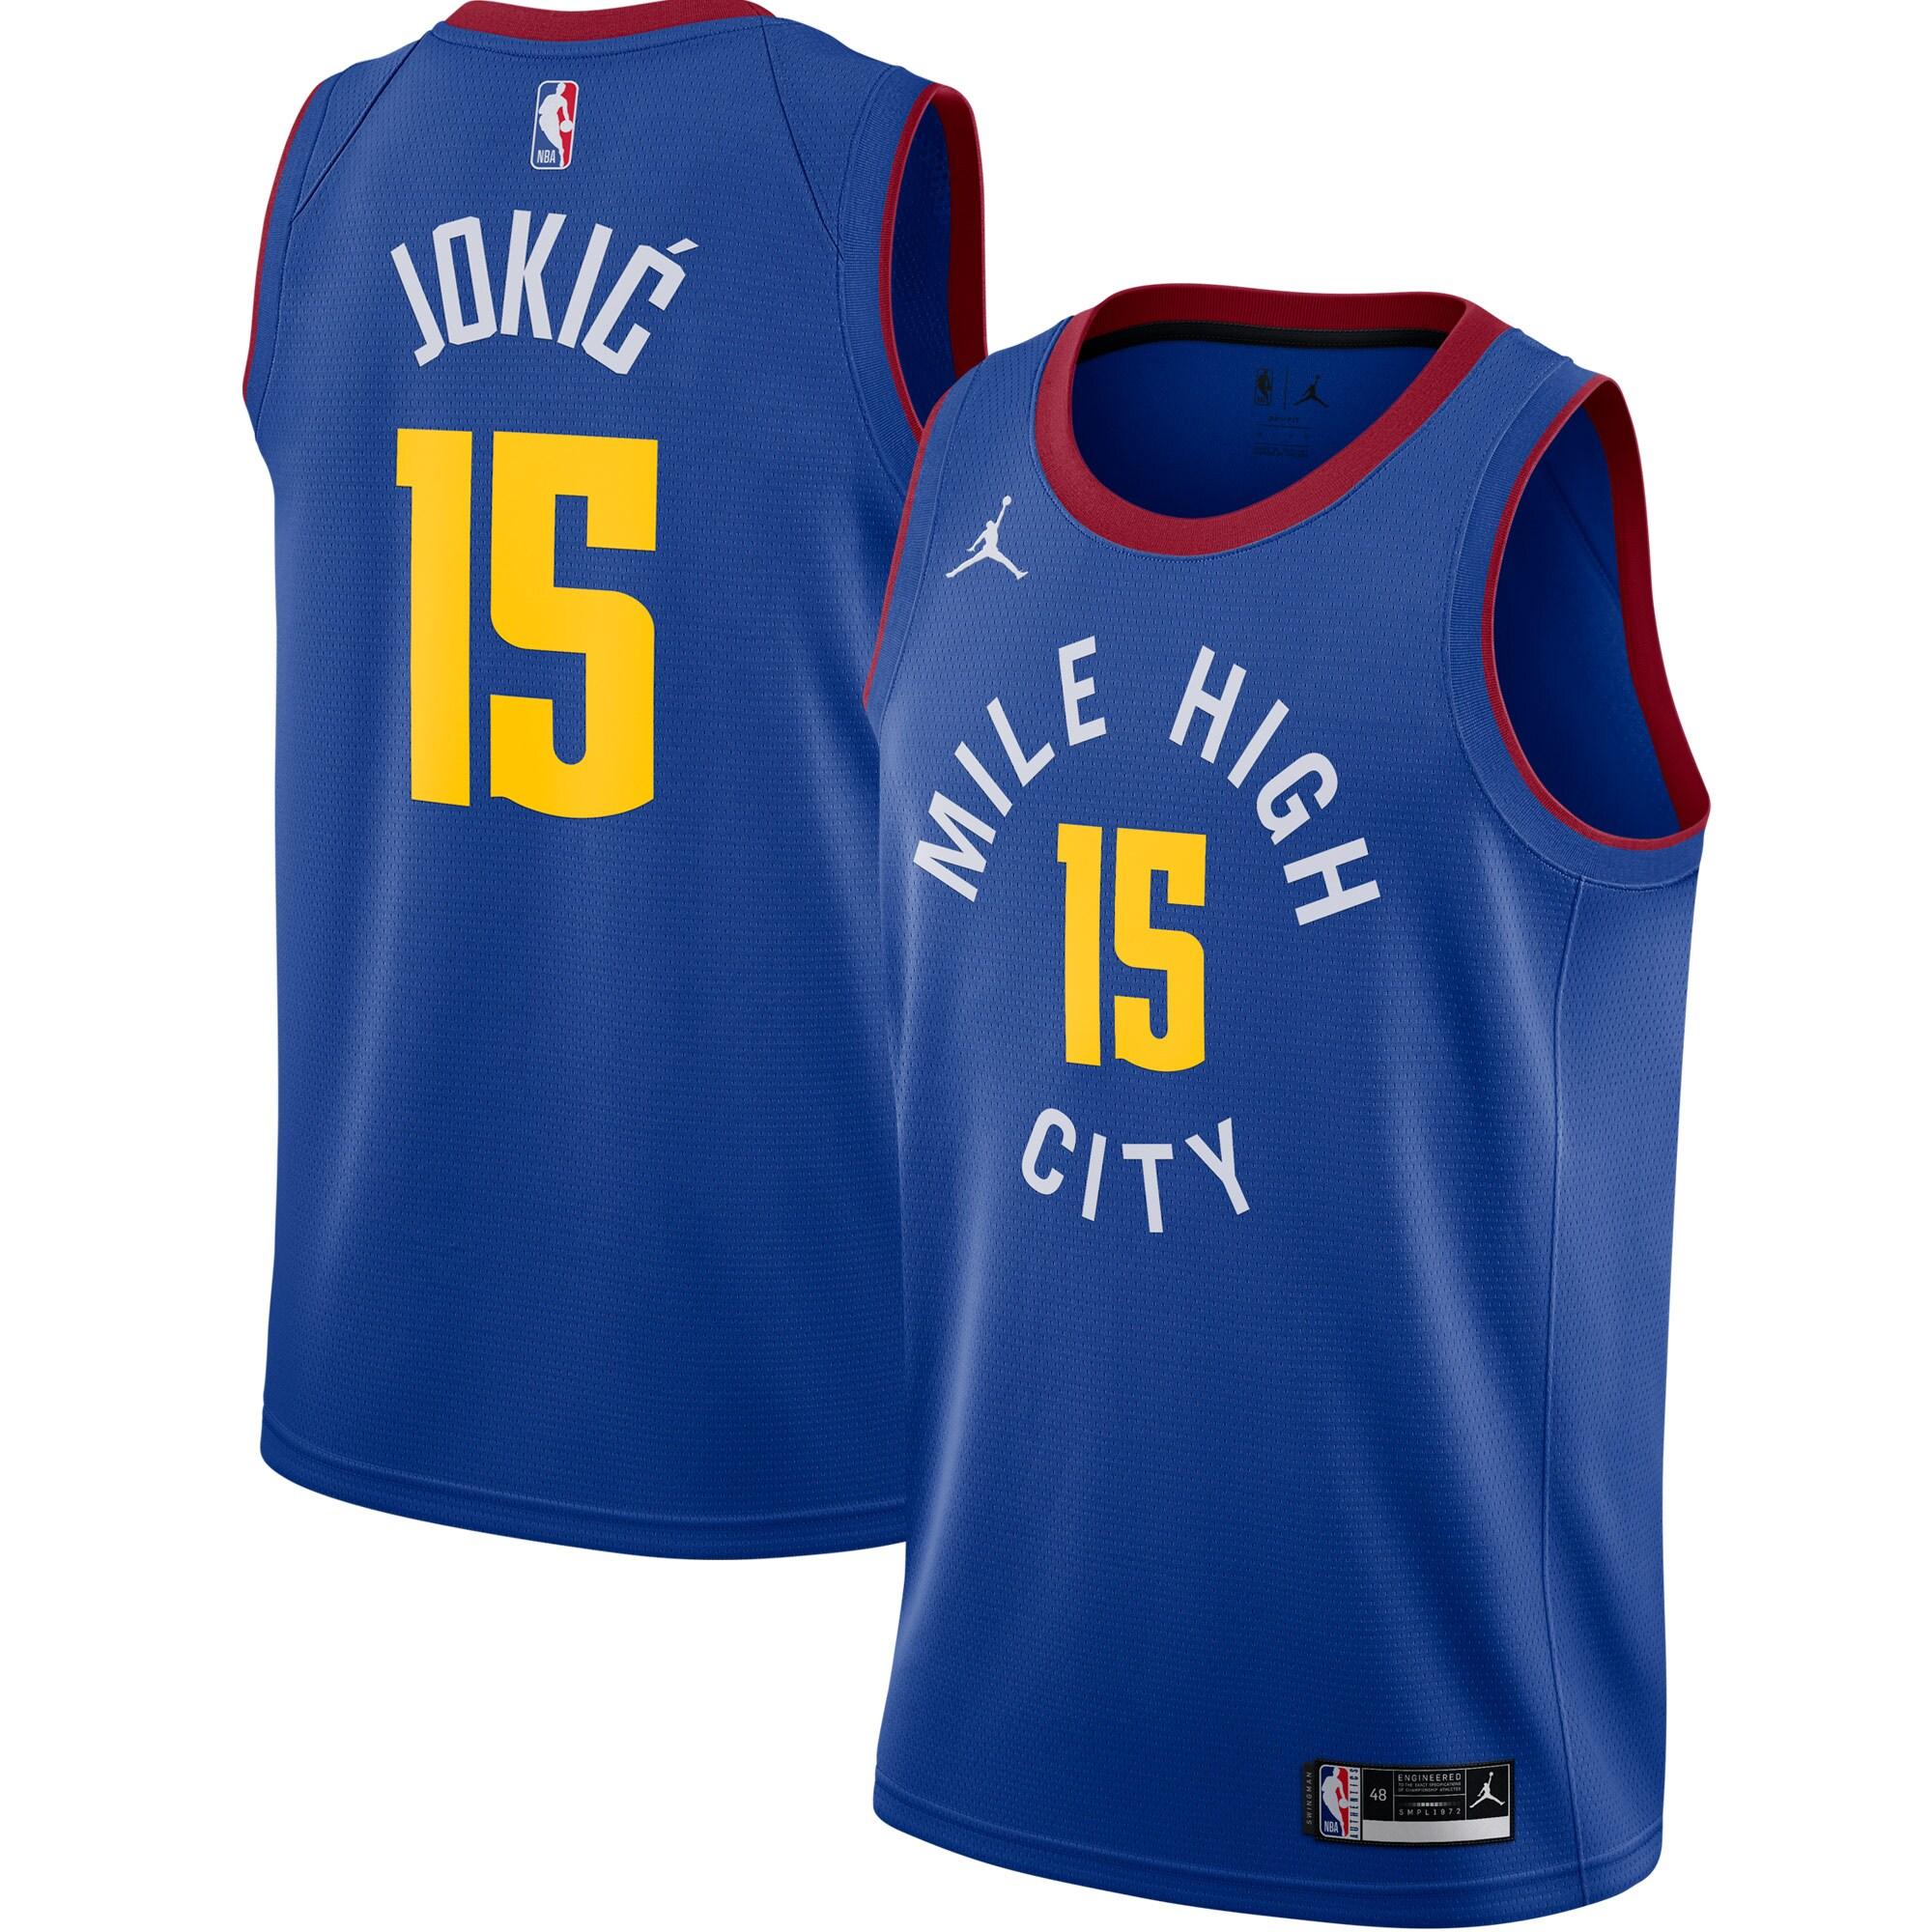 Nikola Jokic Denver Nuggets Jordan Brand 2020/21 Swingman Jersey - Statement Edition - Blue